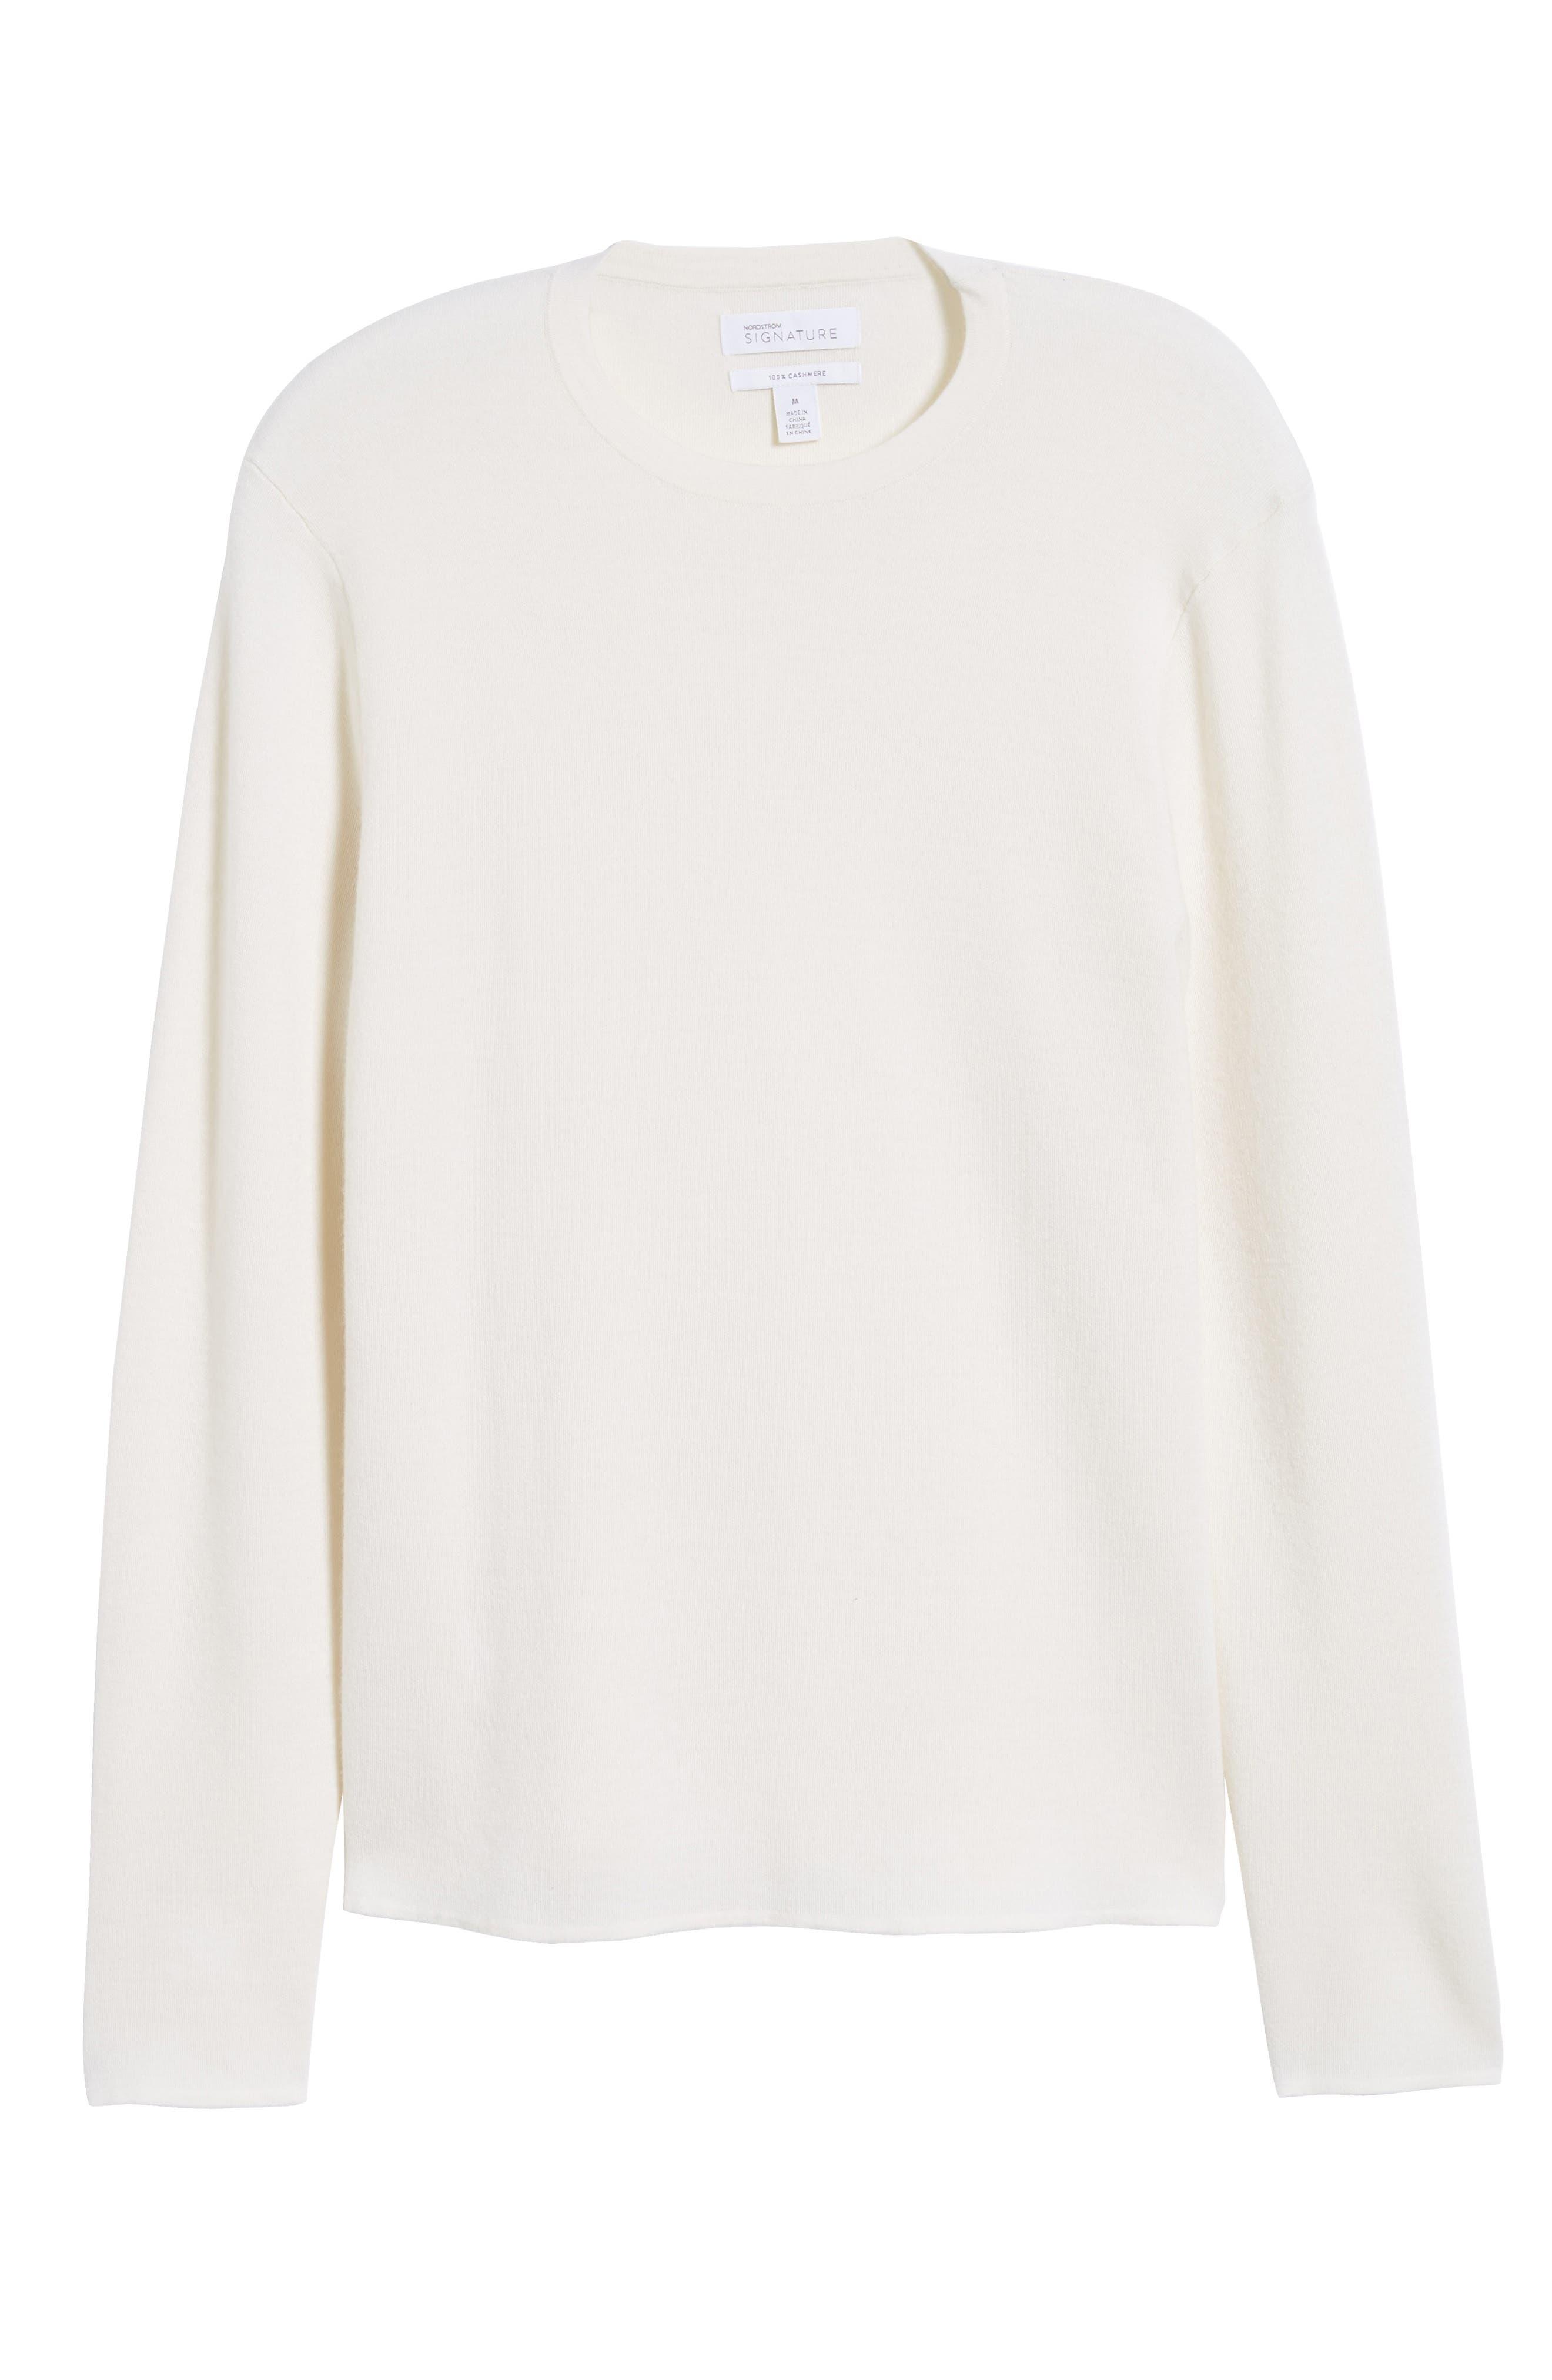 Crewneck Cashmere Sweater,                             Alternate thumbnail 6, color,                             IVORY EGRET